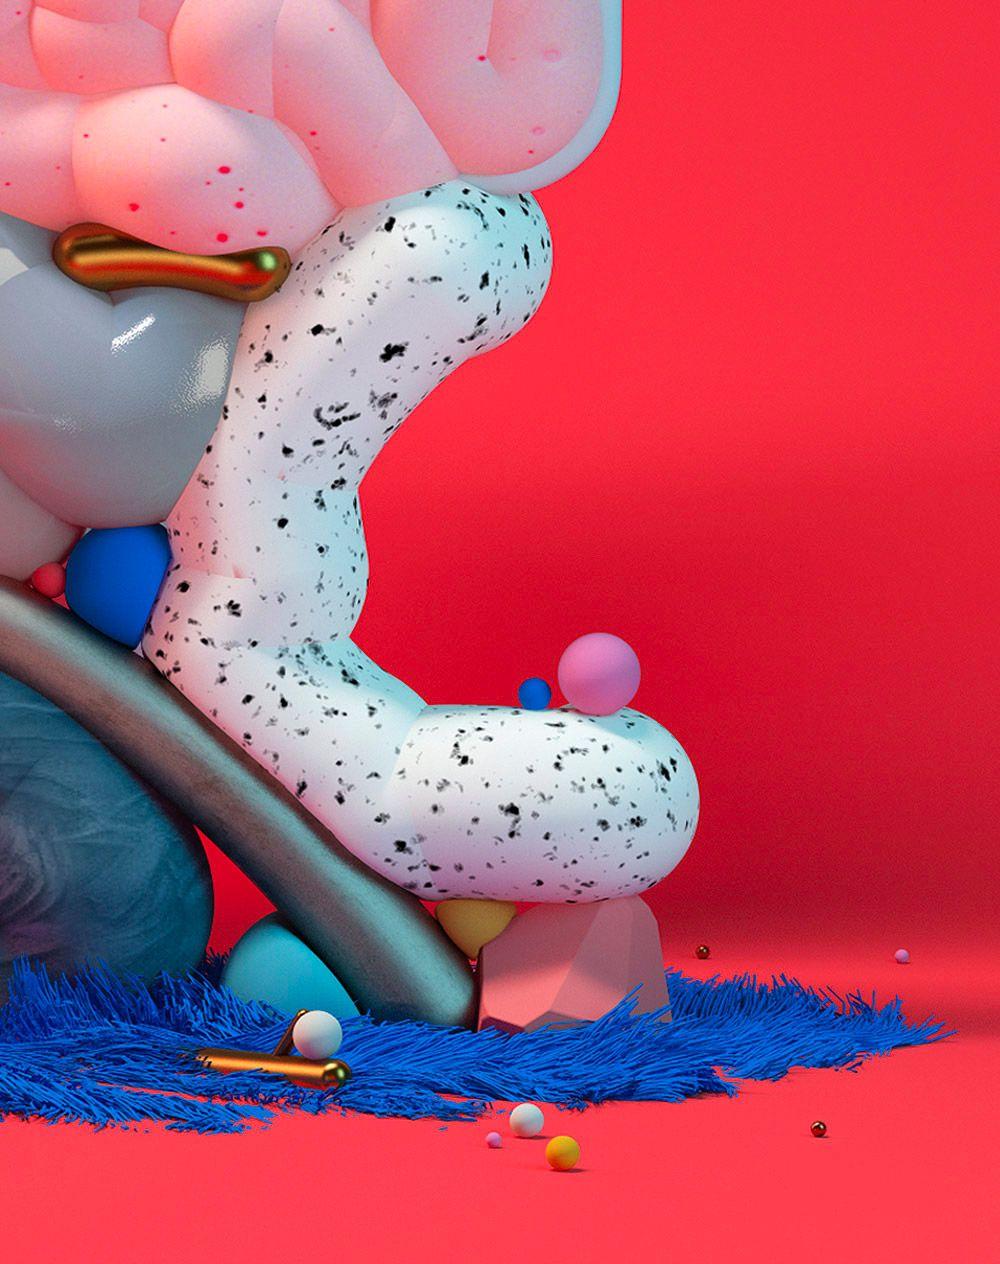 Digital Artworks By Fantasaraxia Cinema D Illustrators And D - Amazing 3d artwork dani aristizabal